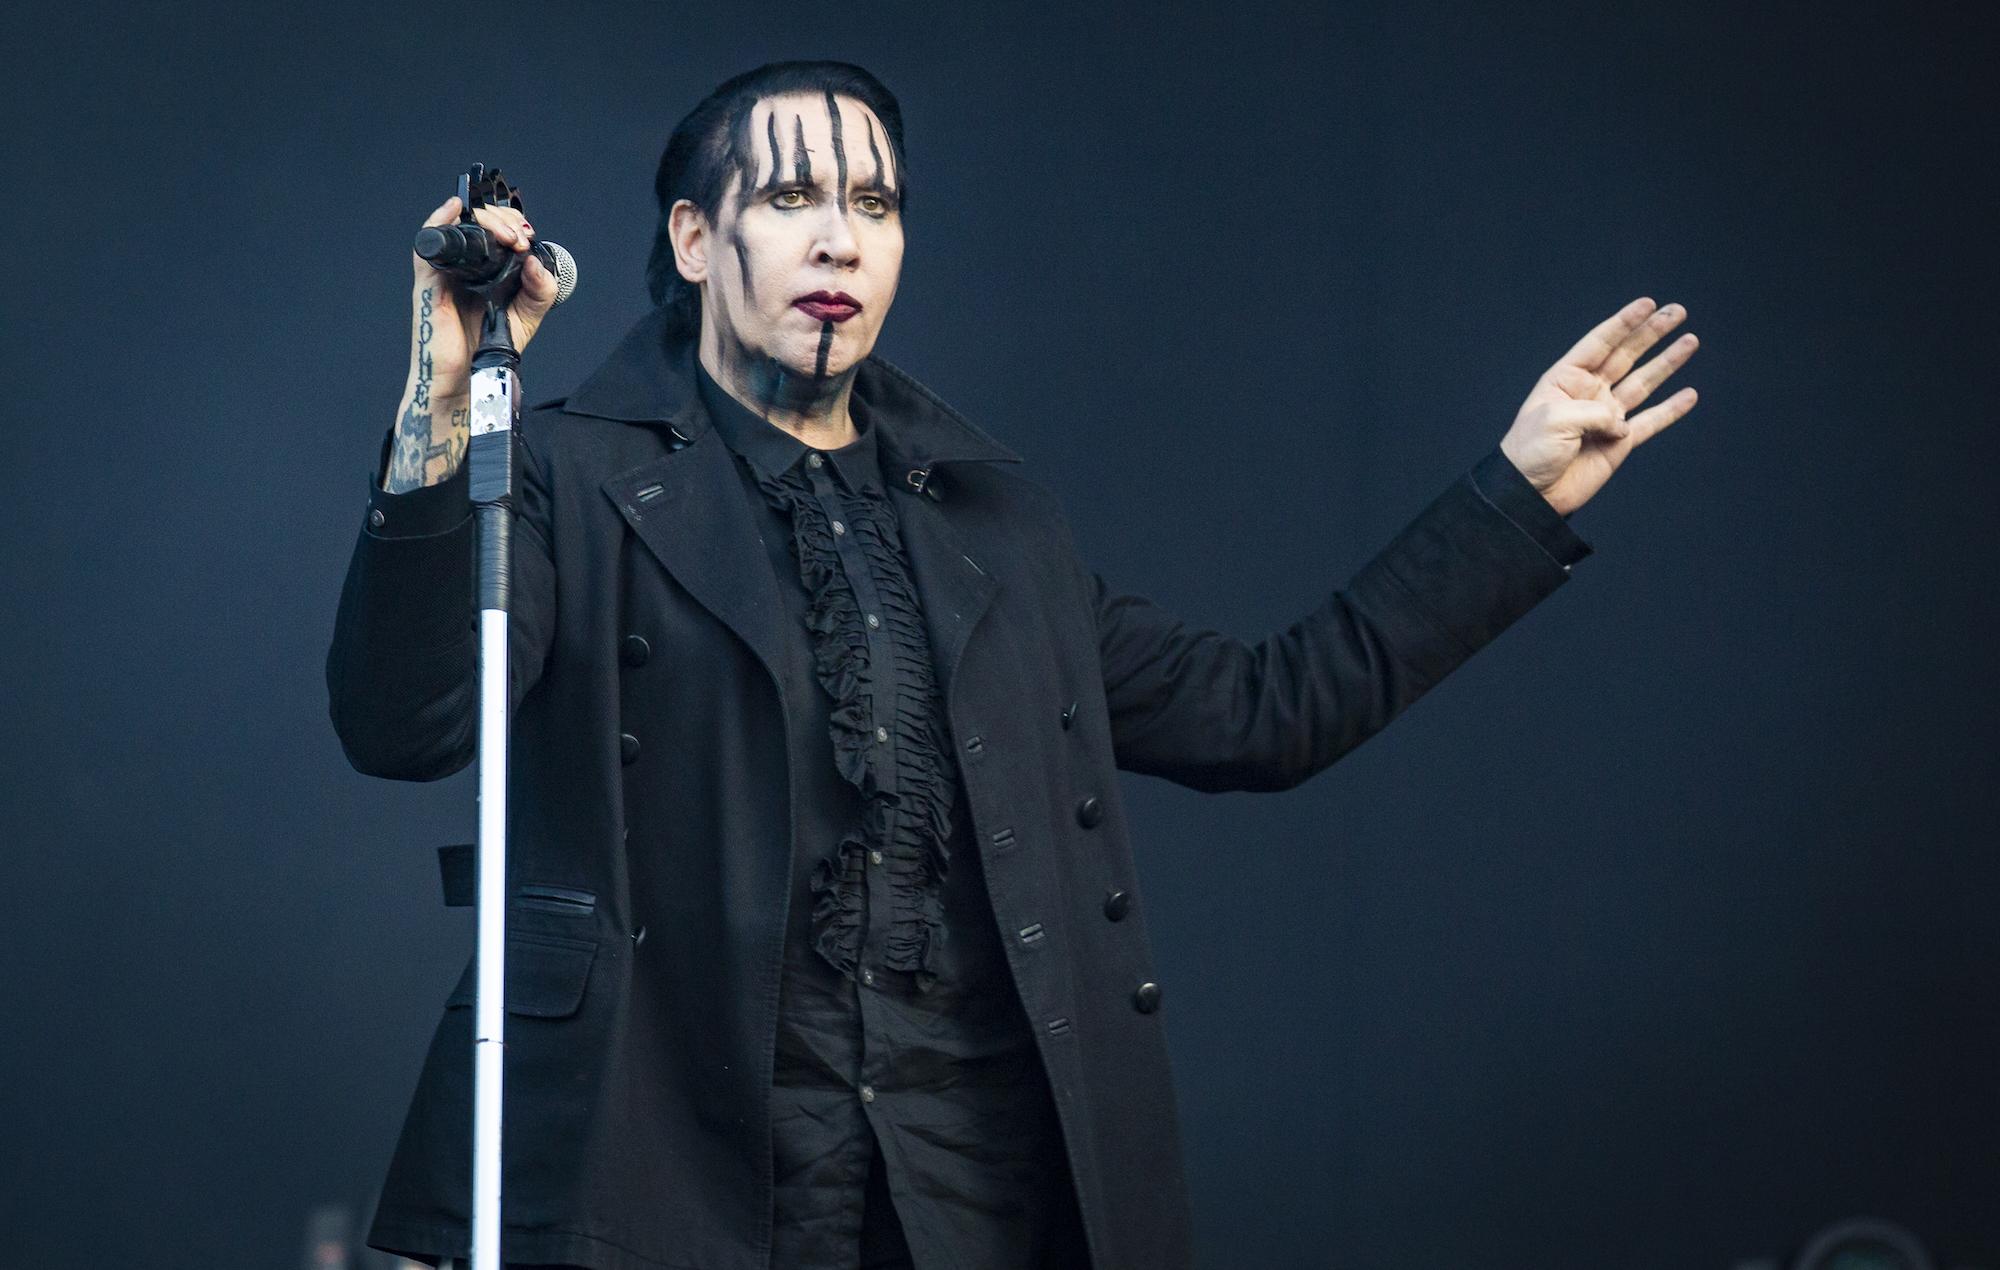 NME Festival blog: Sexual assault case against Marilyn Manson dismissed